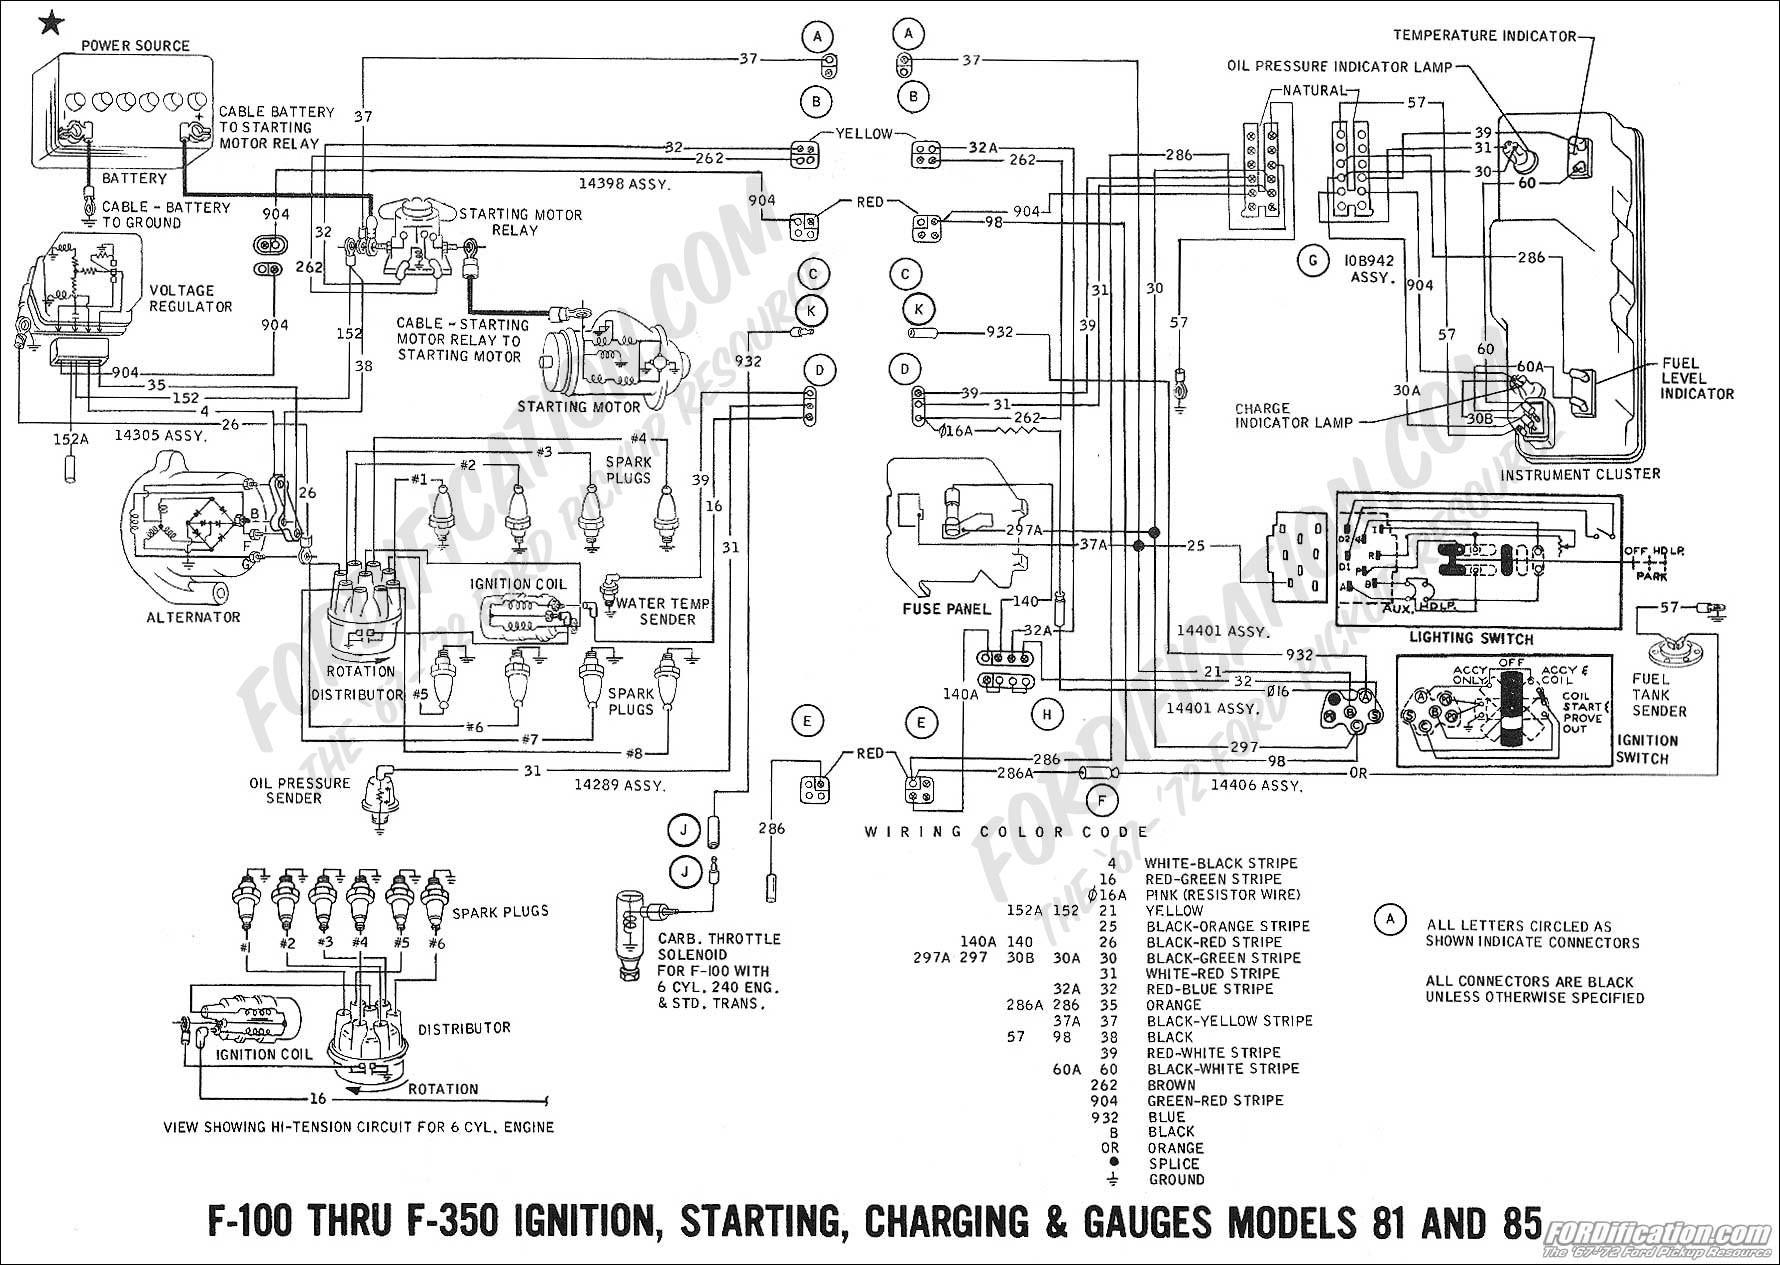 hight resolution of saturn parts diagram wiring diagramsaturn parts diagram everything wiring diagramwrg 1299 saturn engine parts diagram